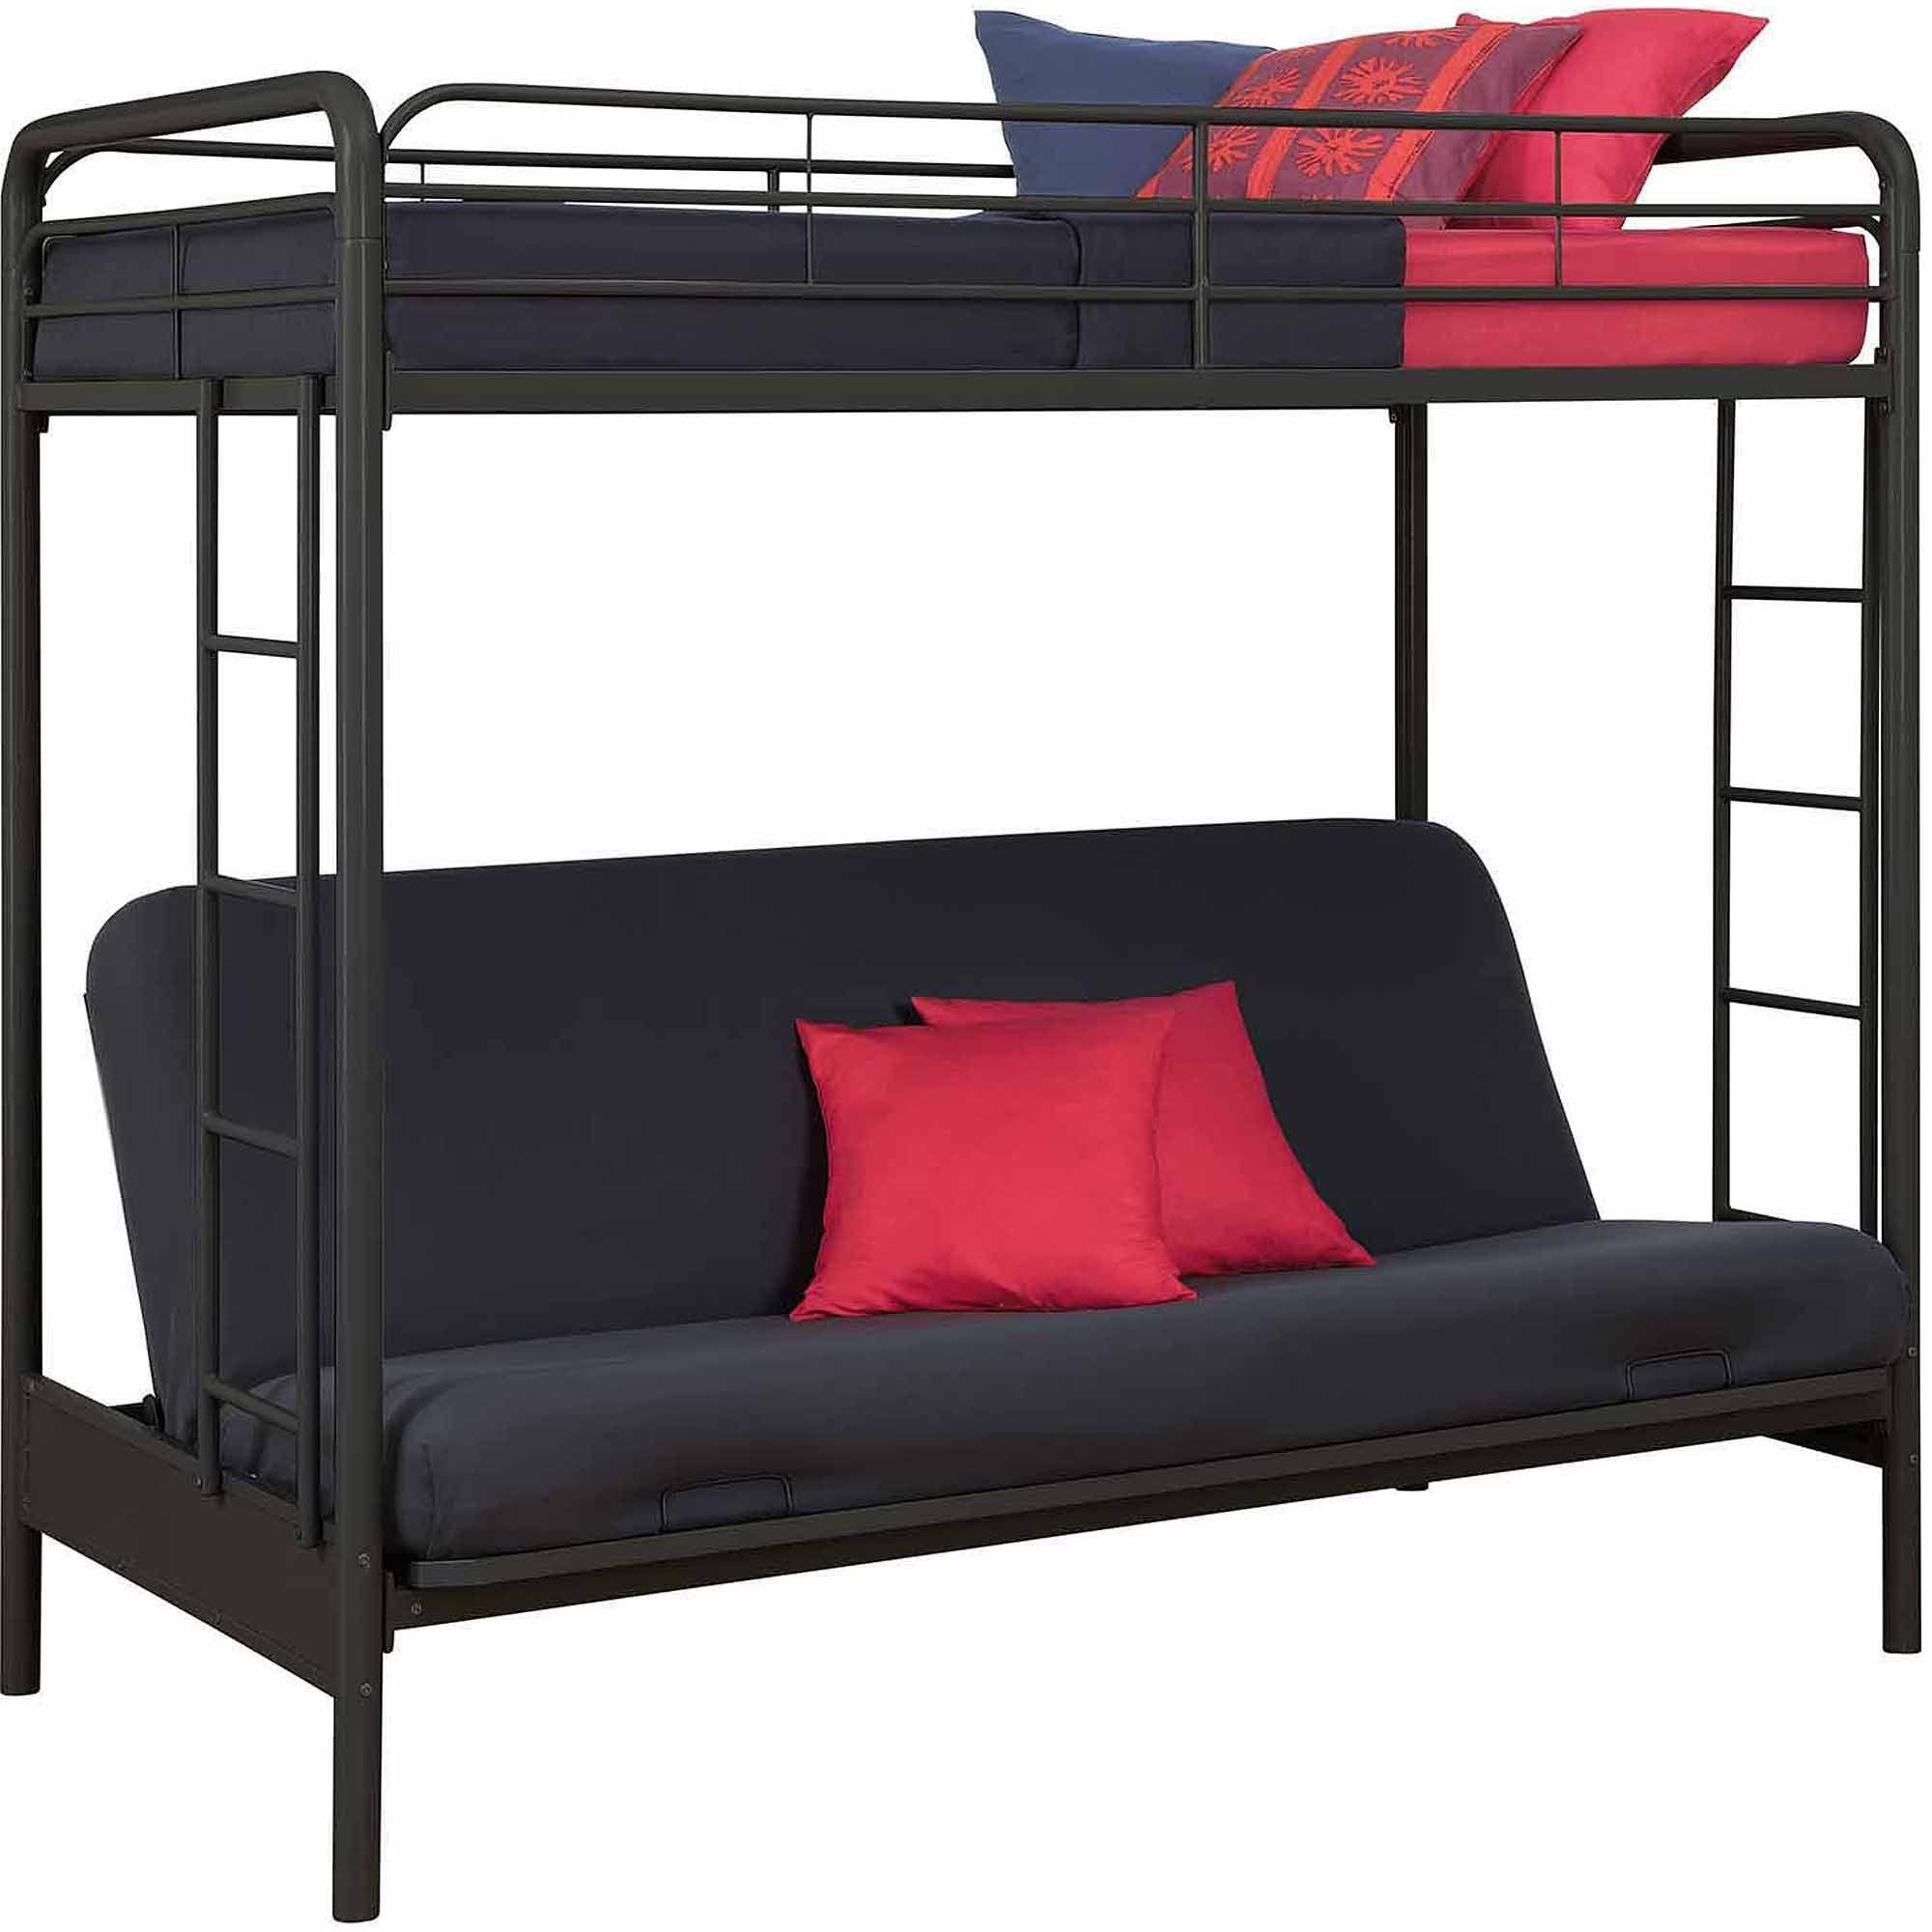 Futon Bed Twin Over Metal Bunk Kids Black Furniture Bedroom Loft Dorm